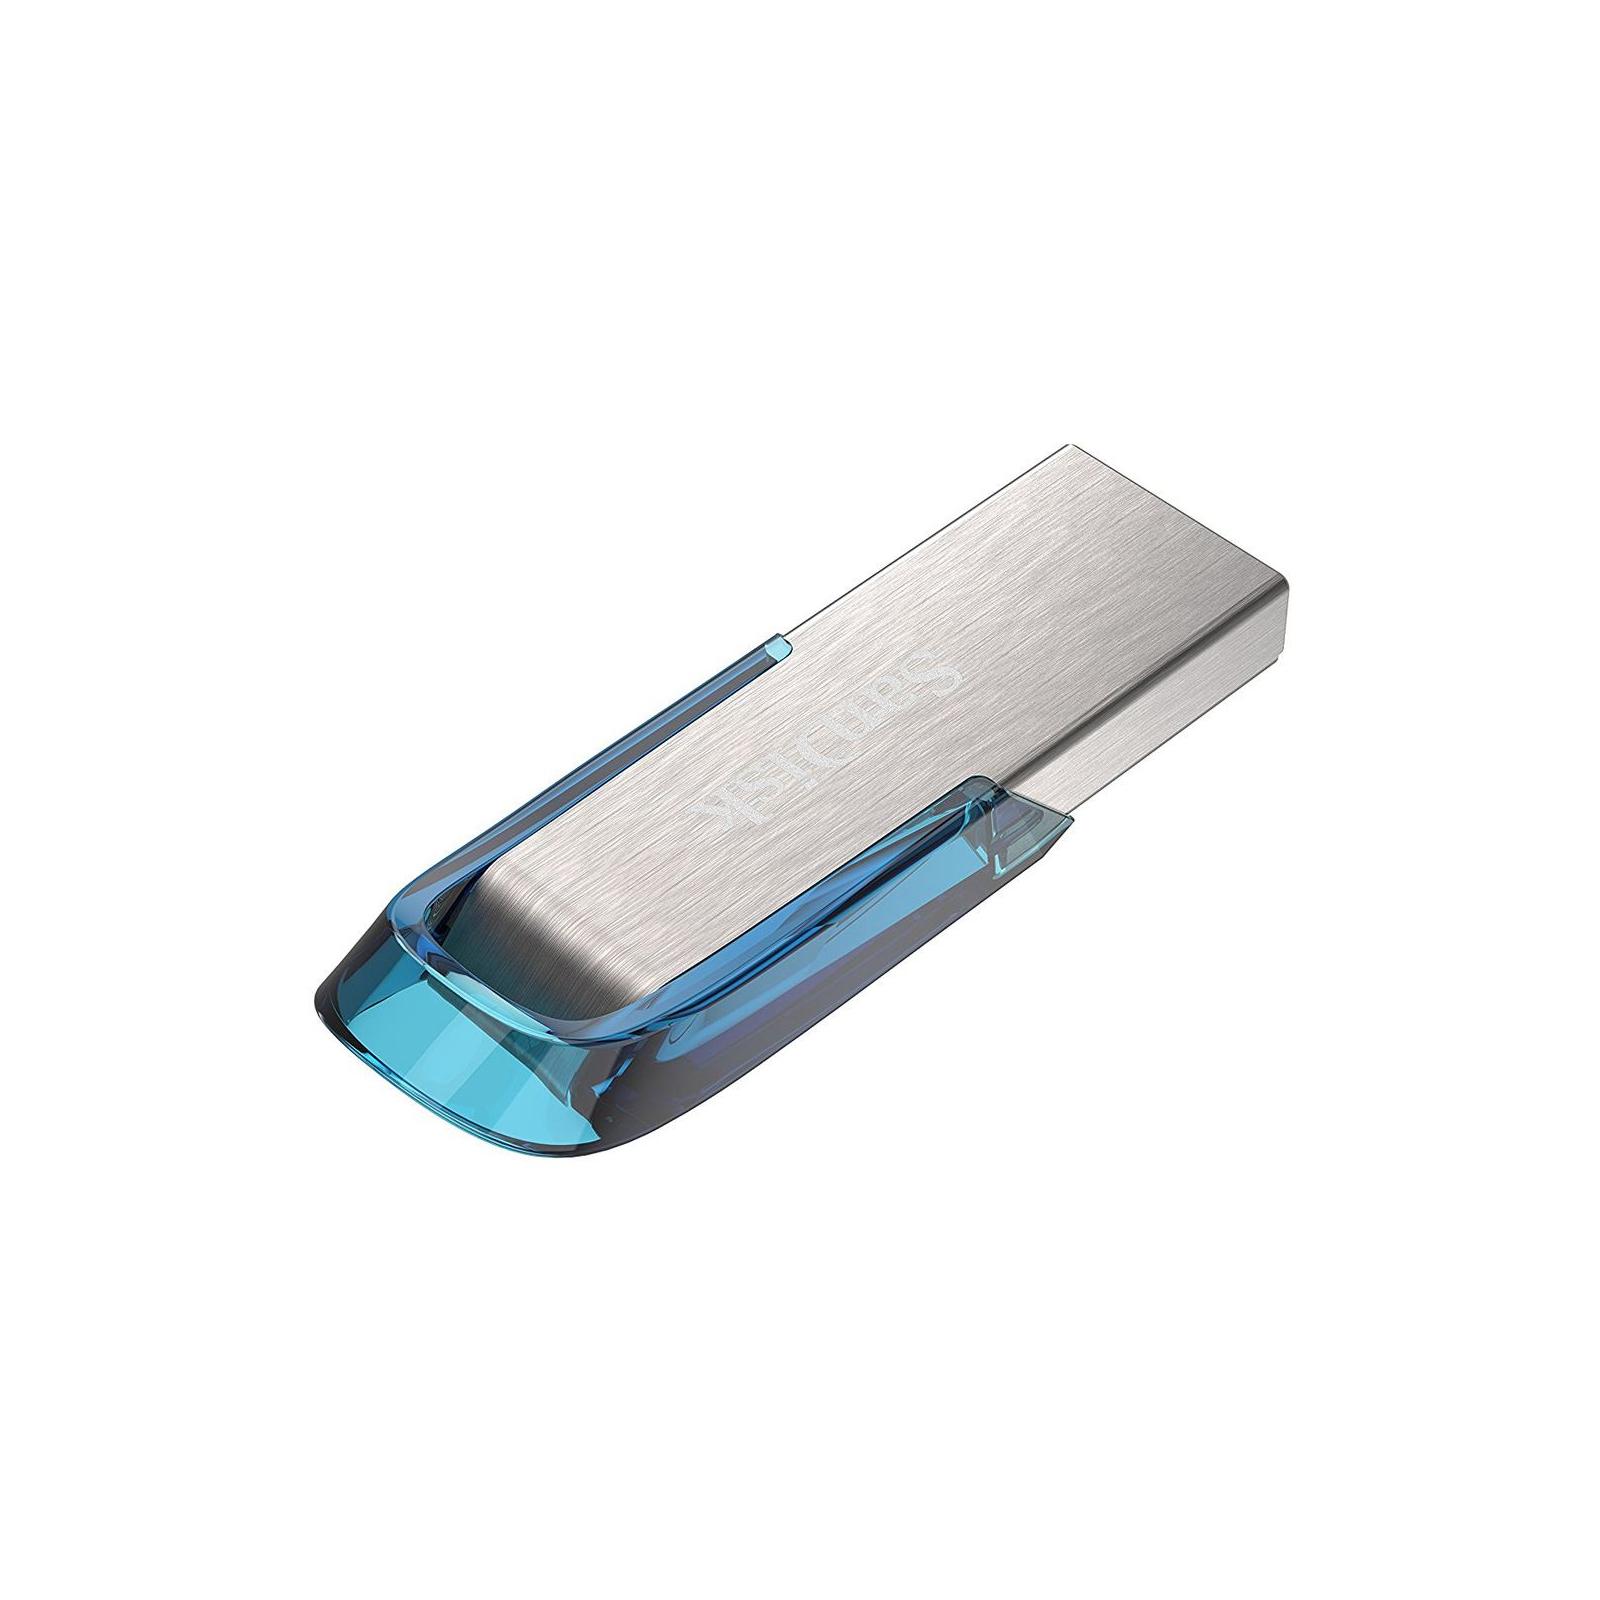 USB флеш накопитель SANDISK 32GB Ultra Flair USB 3.0 (SDCZ73-032G-G46) изображение 3